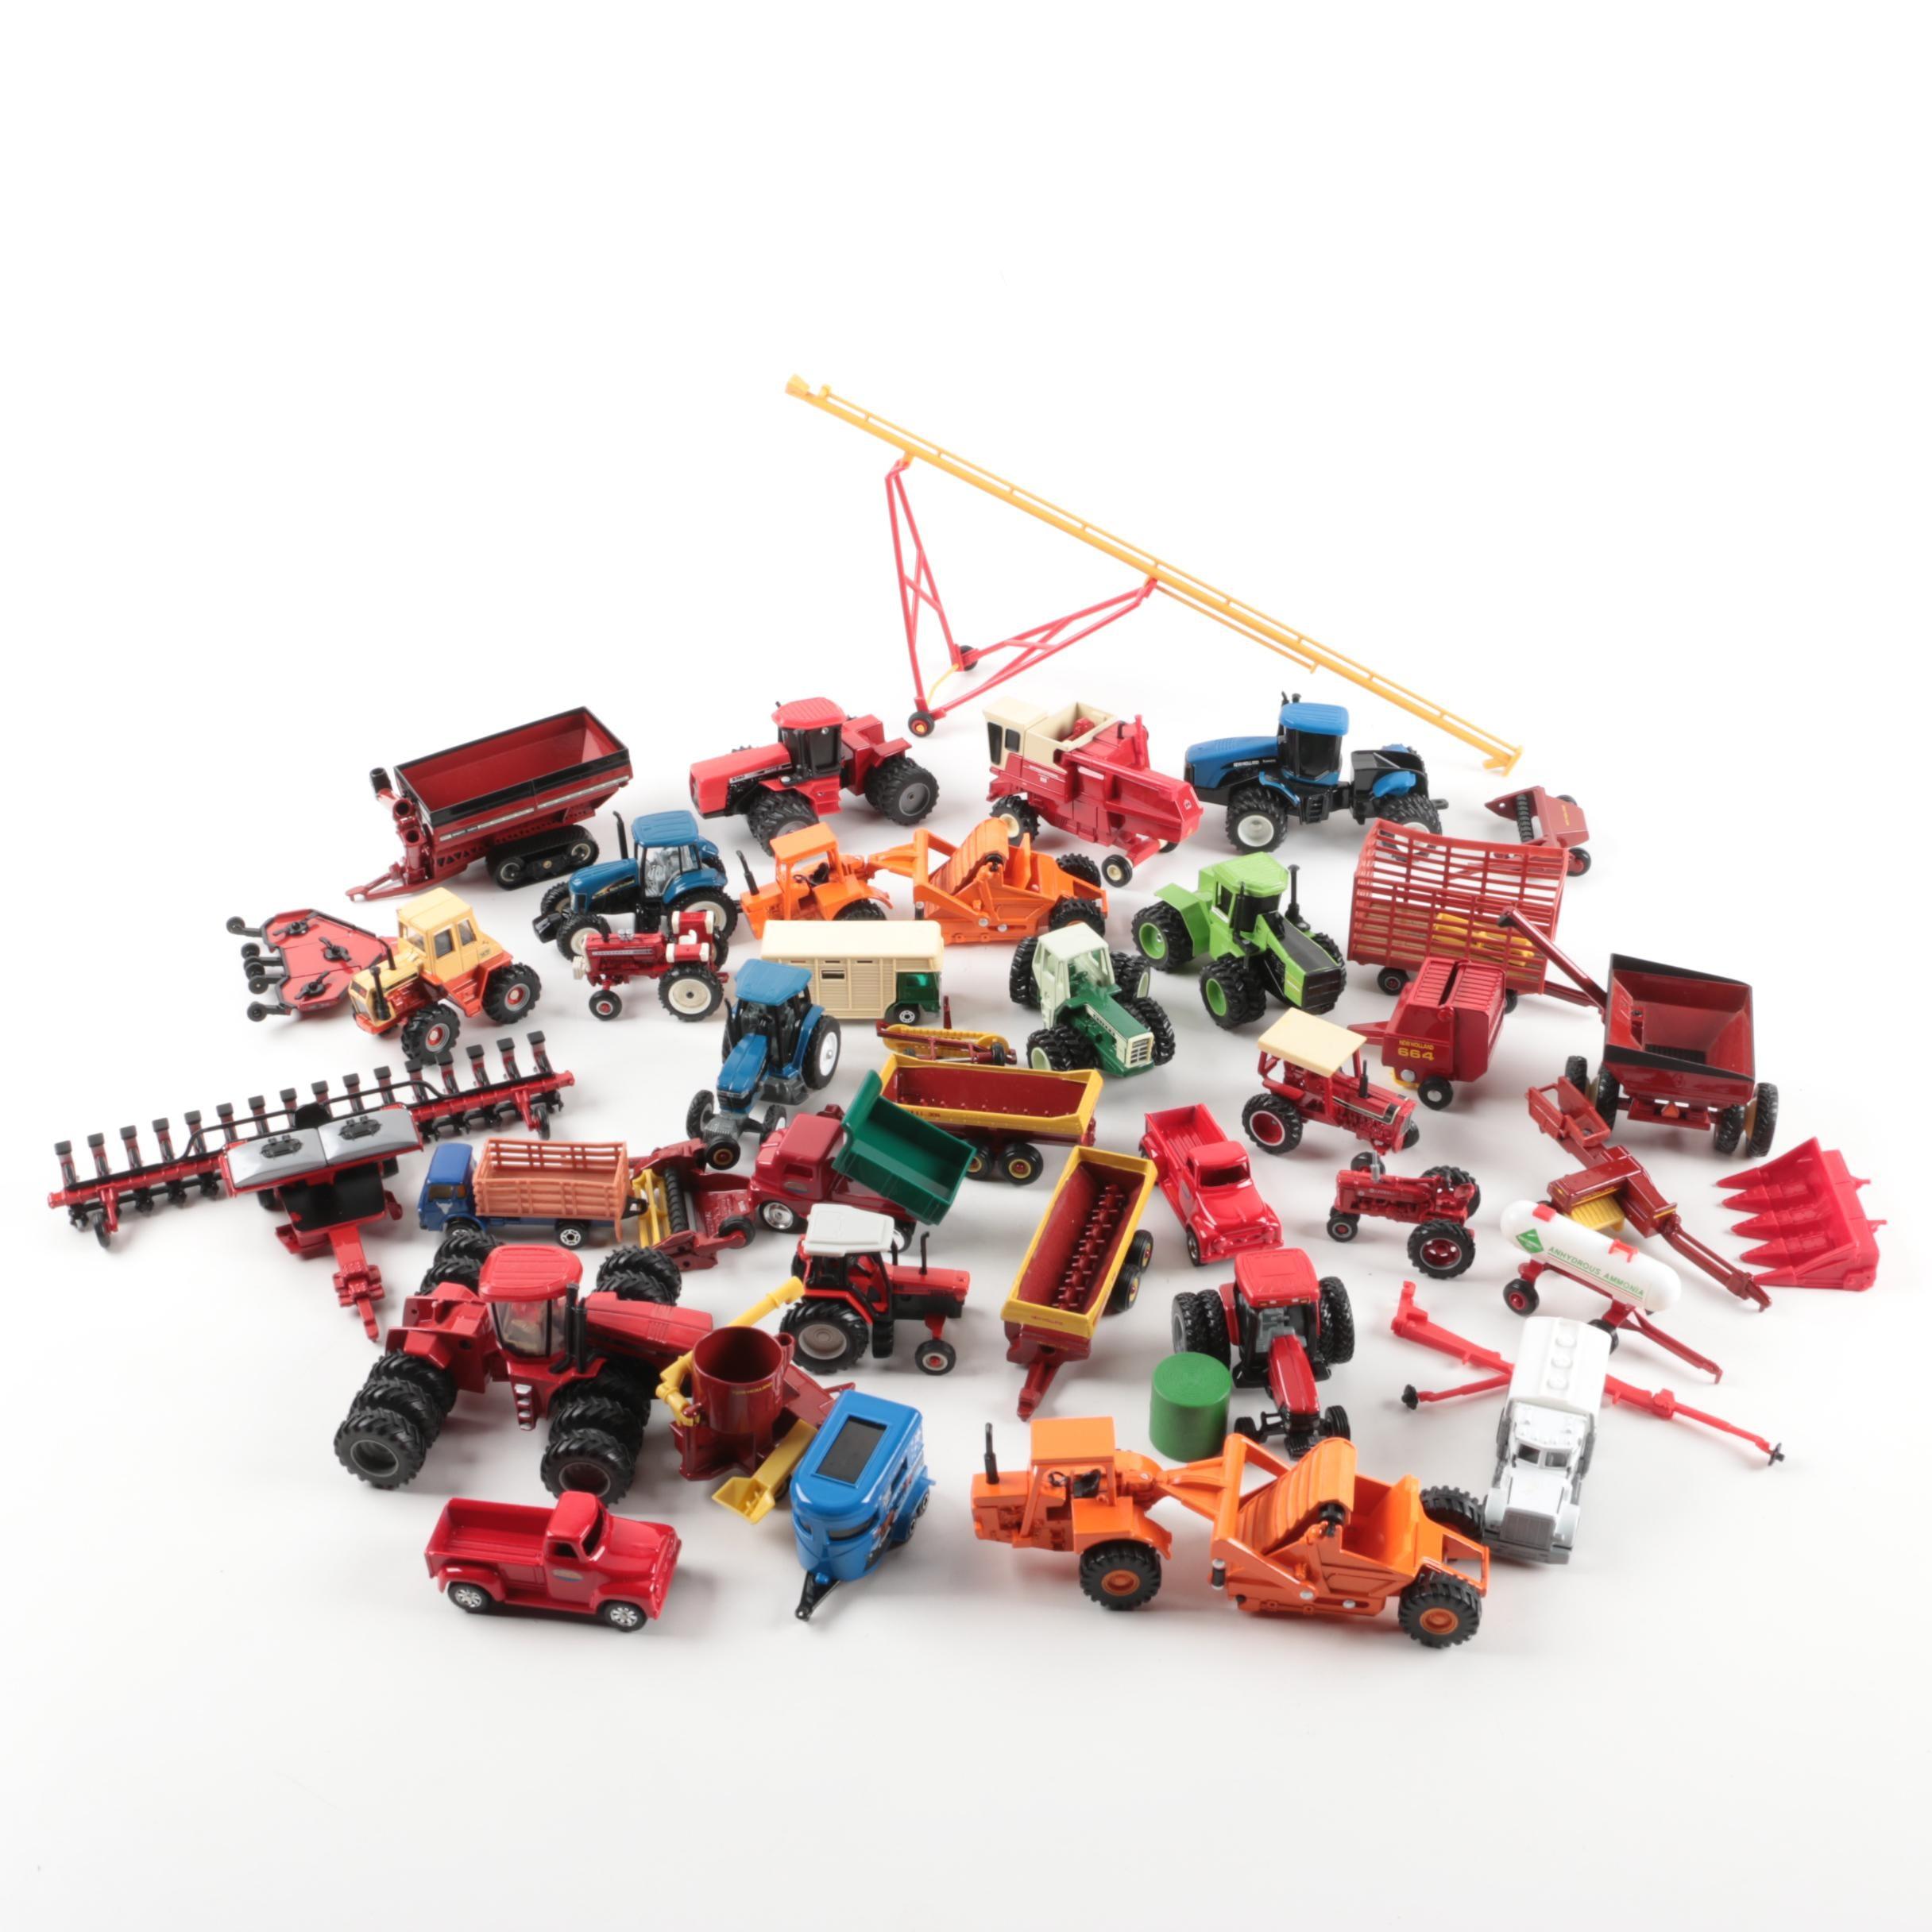 Assortment of Die-Cast Farm Vehicles